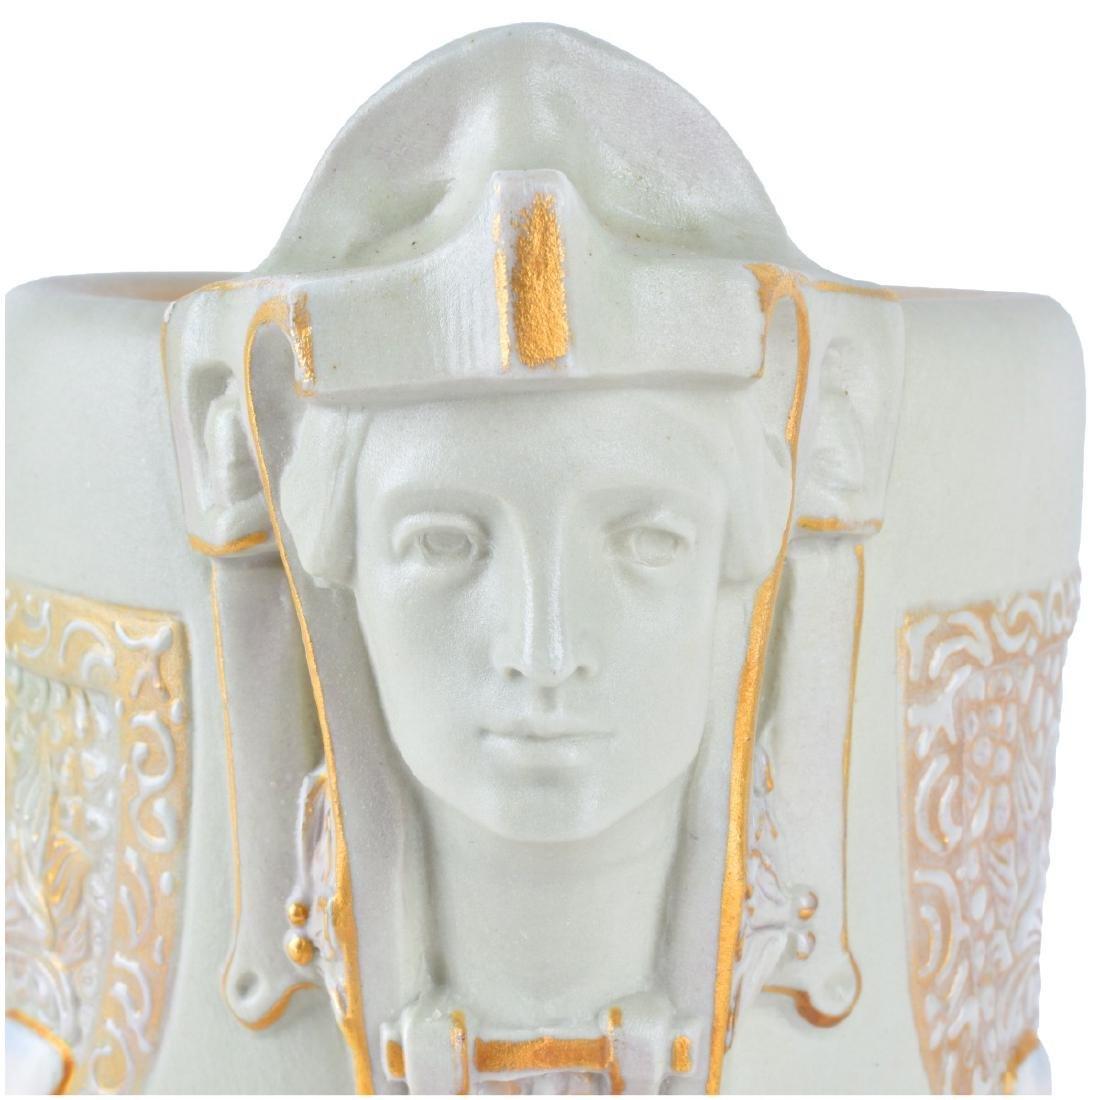 Ernst Wahliss Art Nouveau Ceramic Figural Vase - 4